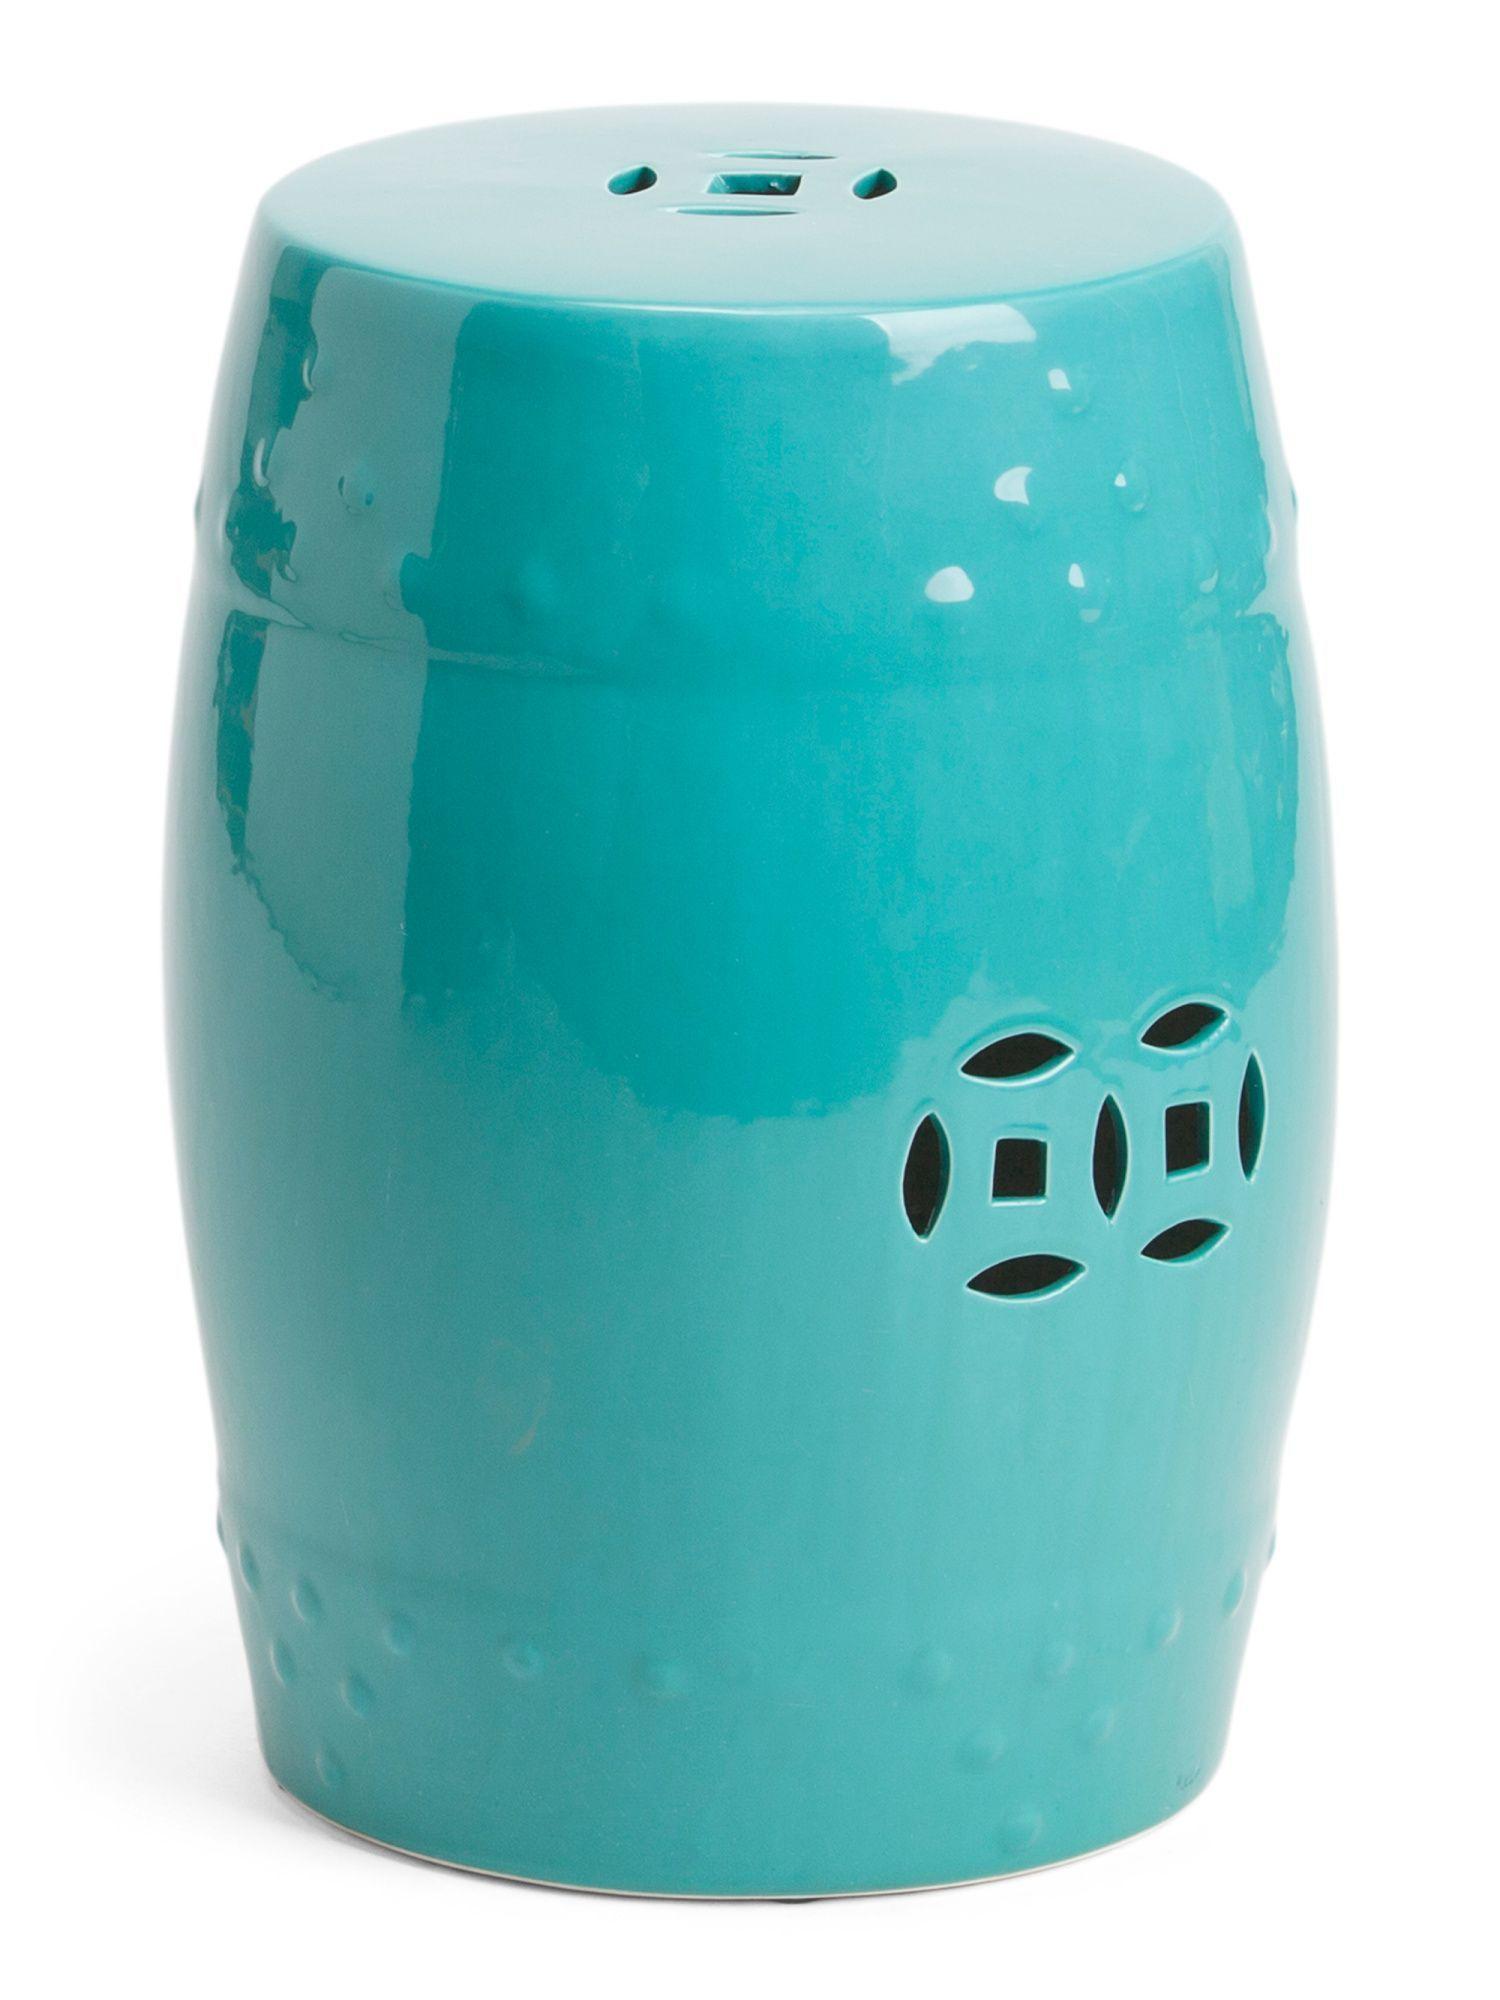 Surprising Ceramic Garden Stool Products Ceramic Garden Stools Pabps2019 Chair Design Images Pabps2019Com